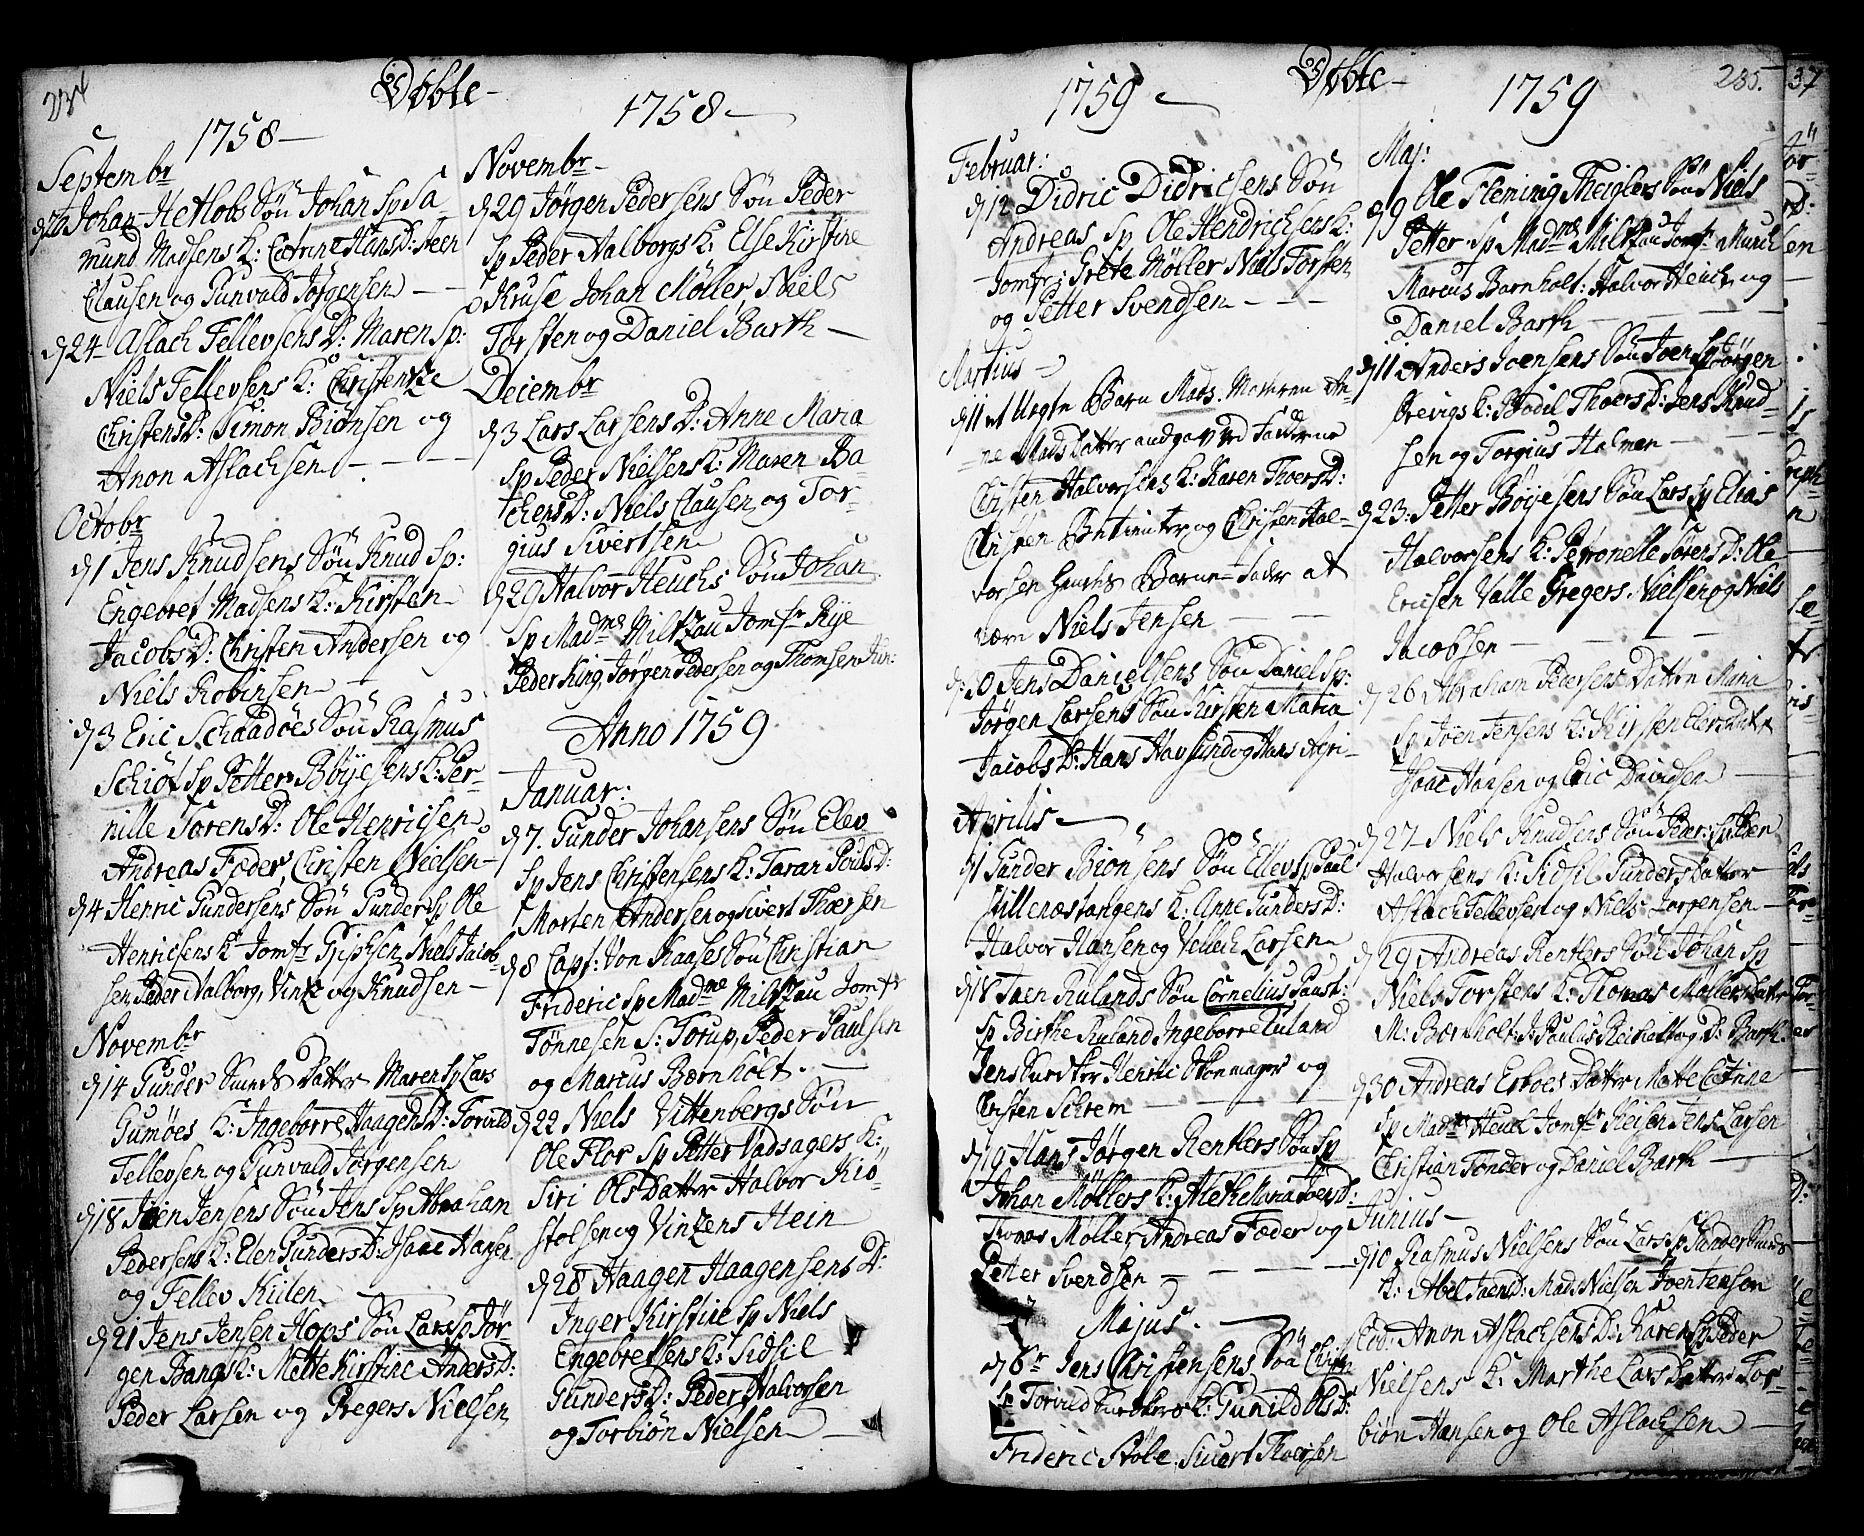 SAKO, Kragerø kirkebøker, F/Fa/L0001: Ministerialbok nr. 1, 1702-1766, s. 234-235